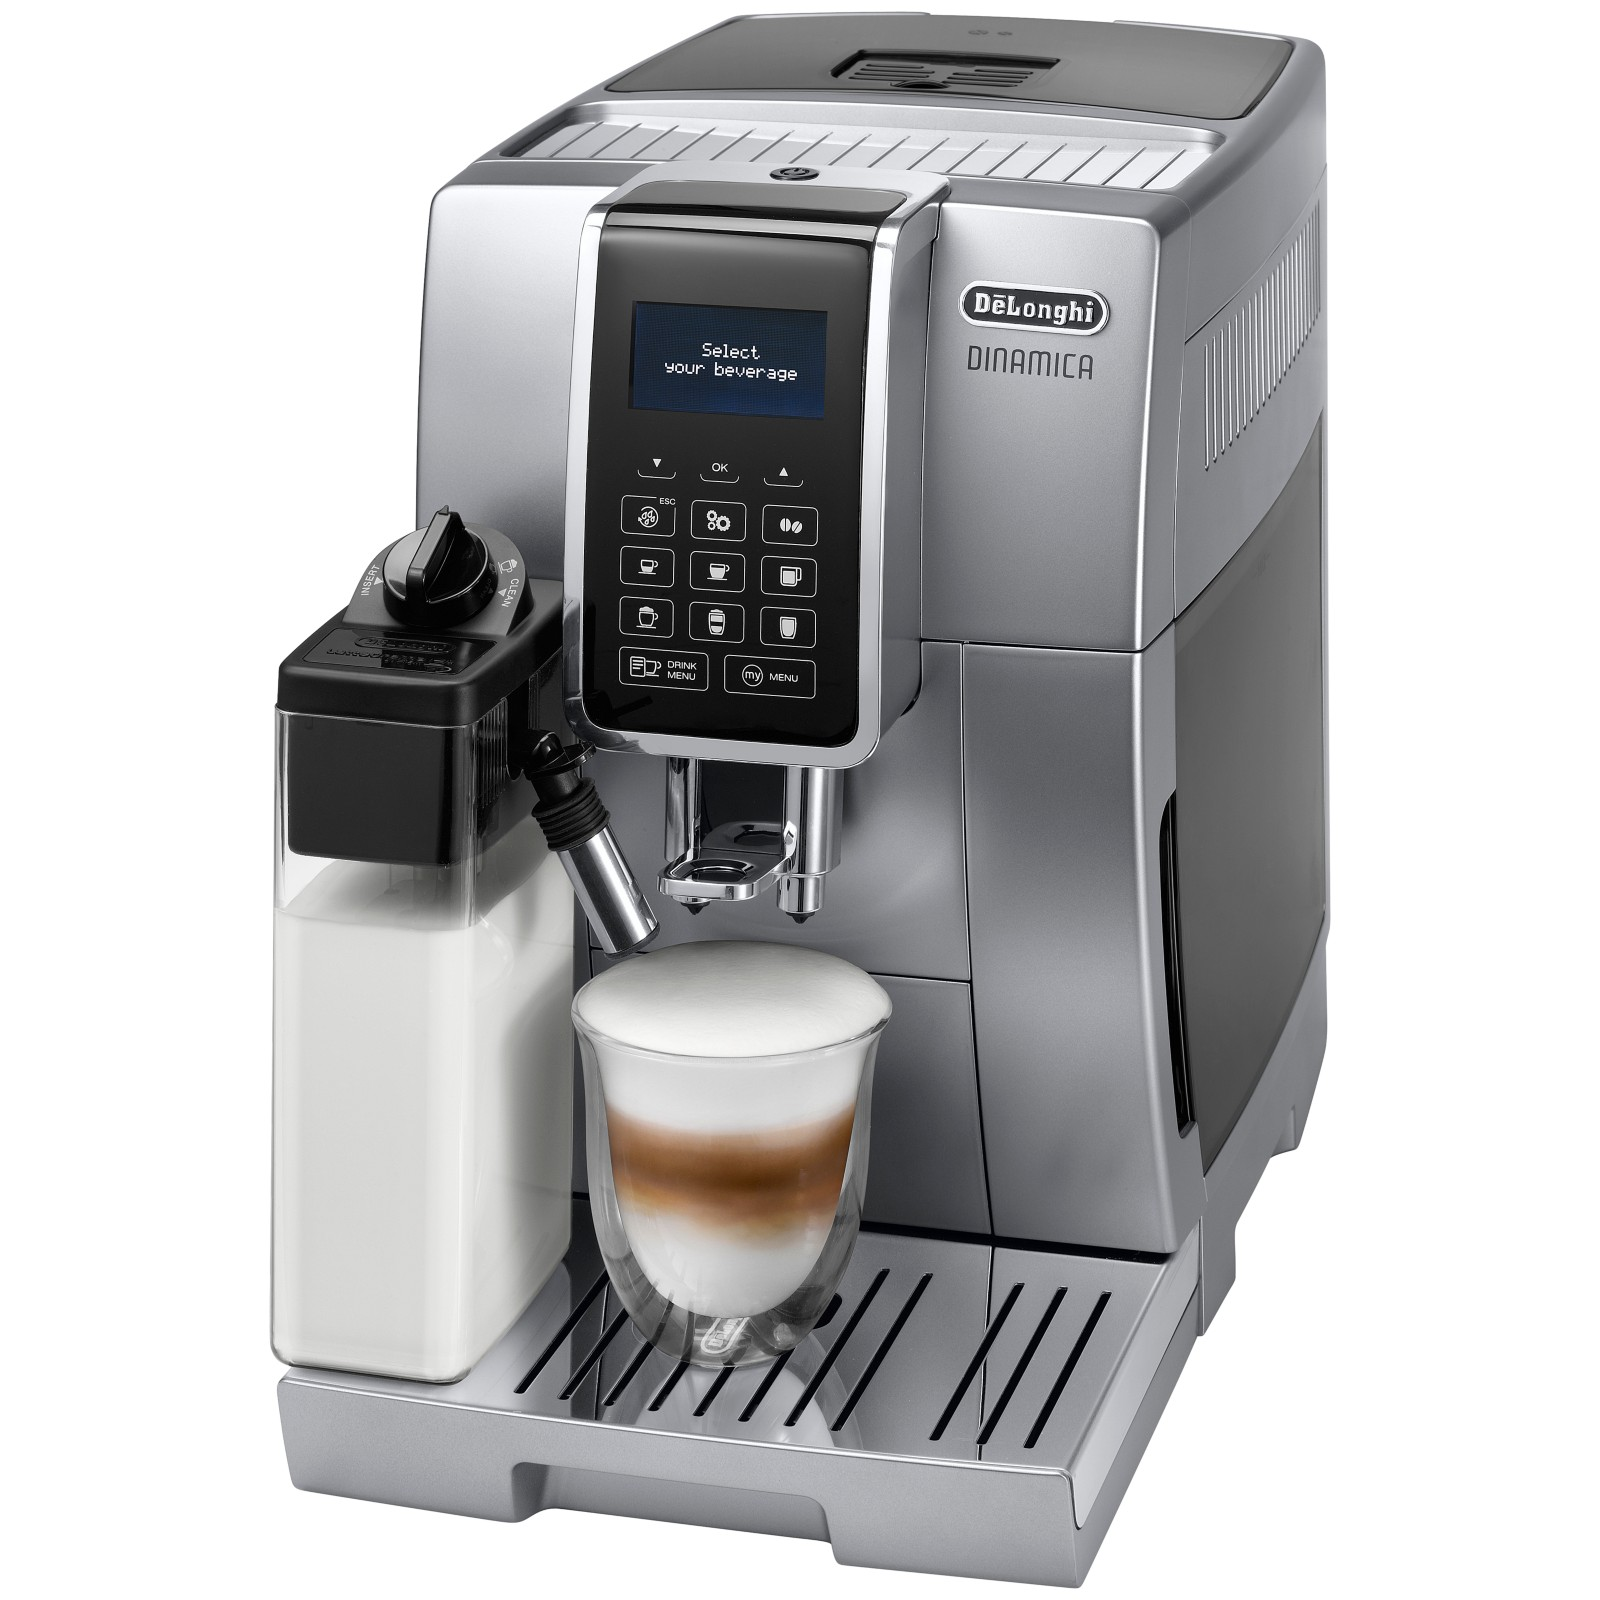 De'Longhi ECAM350.75.SB Dinamica Bean to Cup Coffee Machine